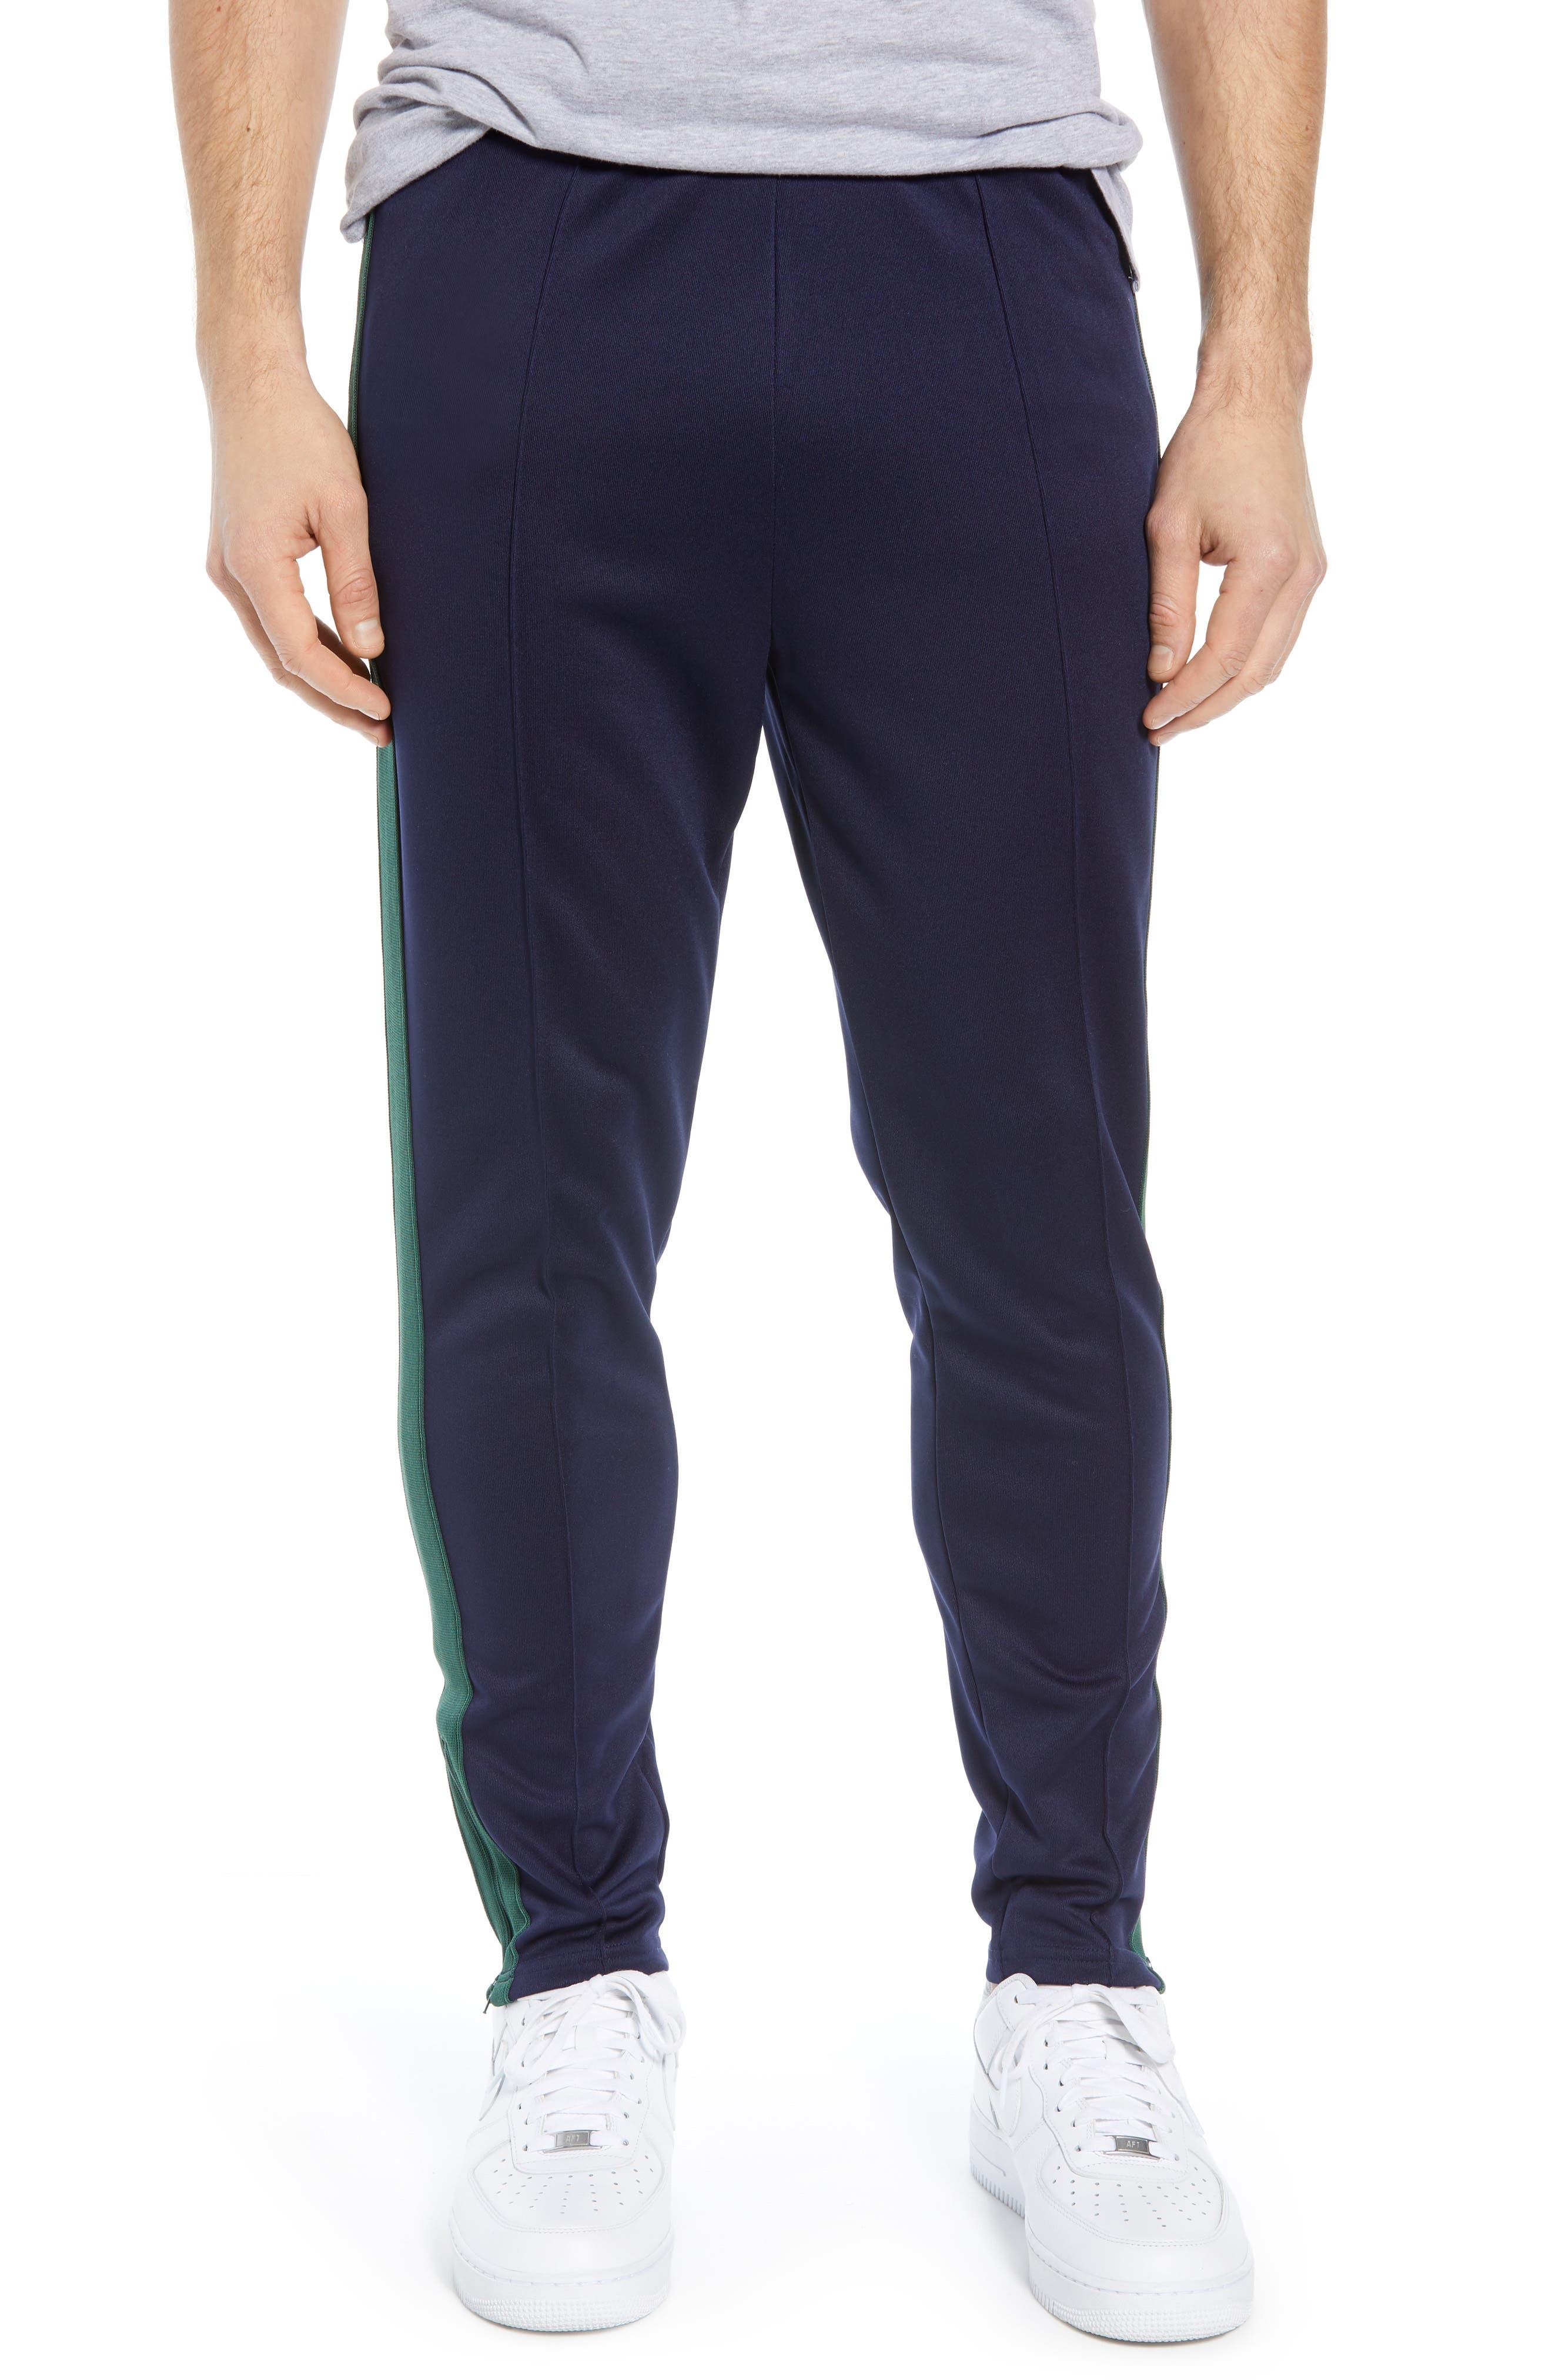 NIKE x Martine Rose Men's Track Pants, Main, color, BLACKENED BLUE/ FIR